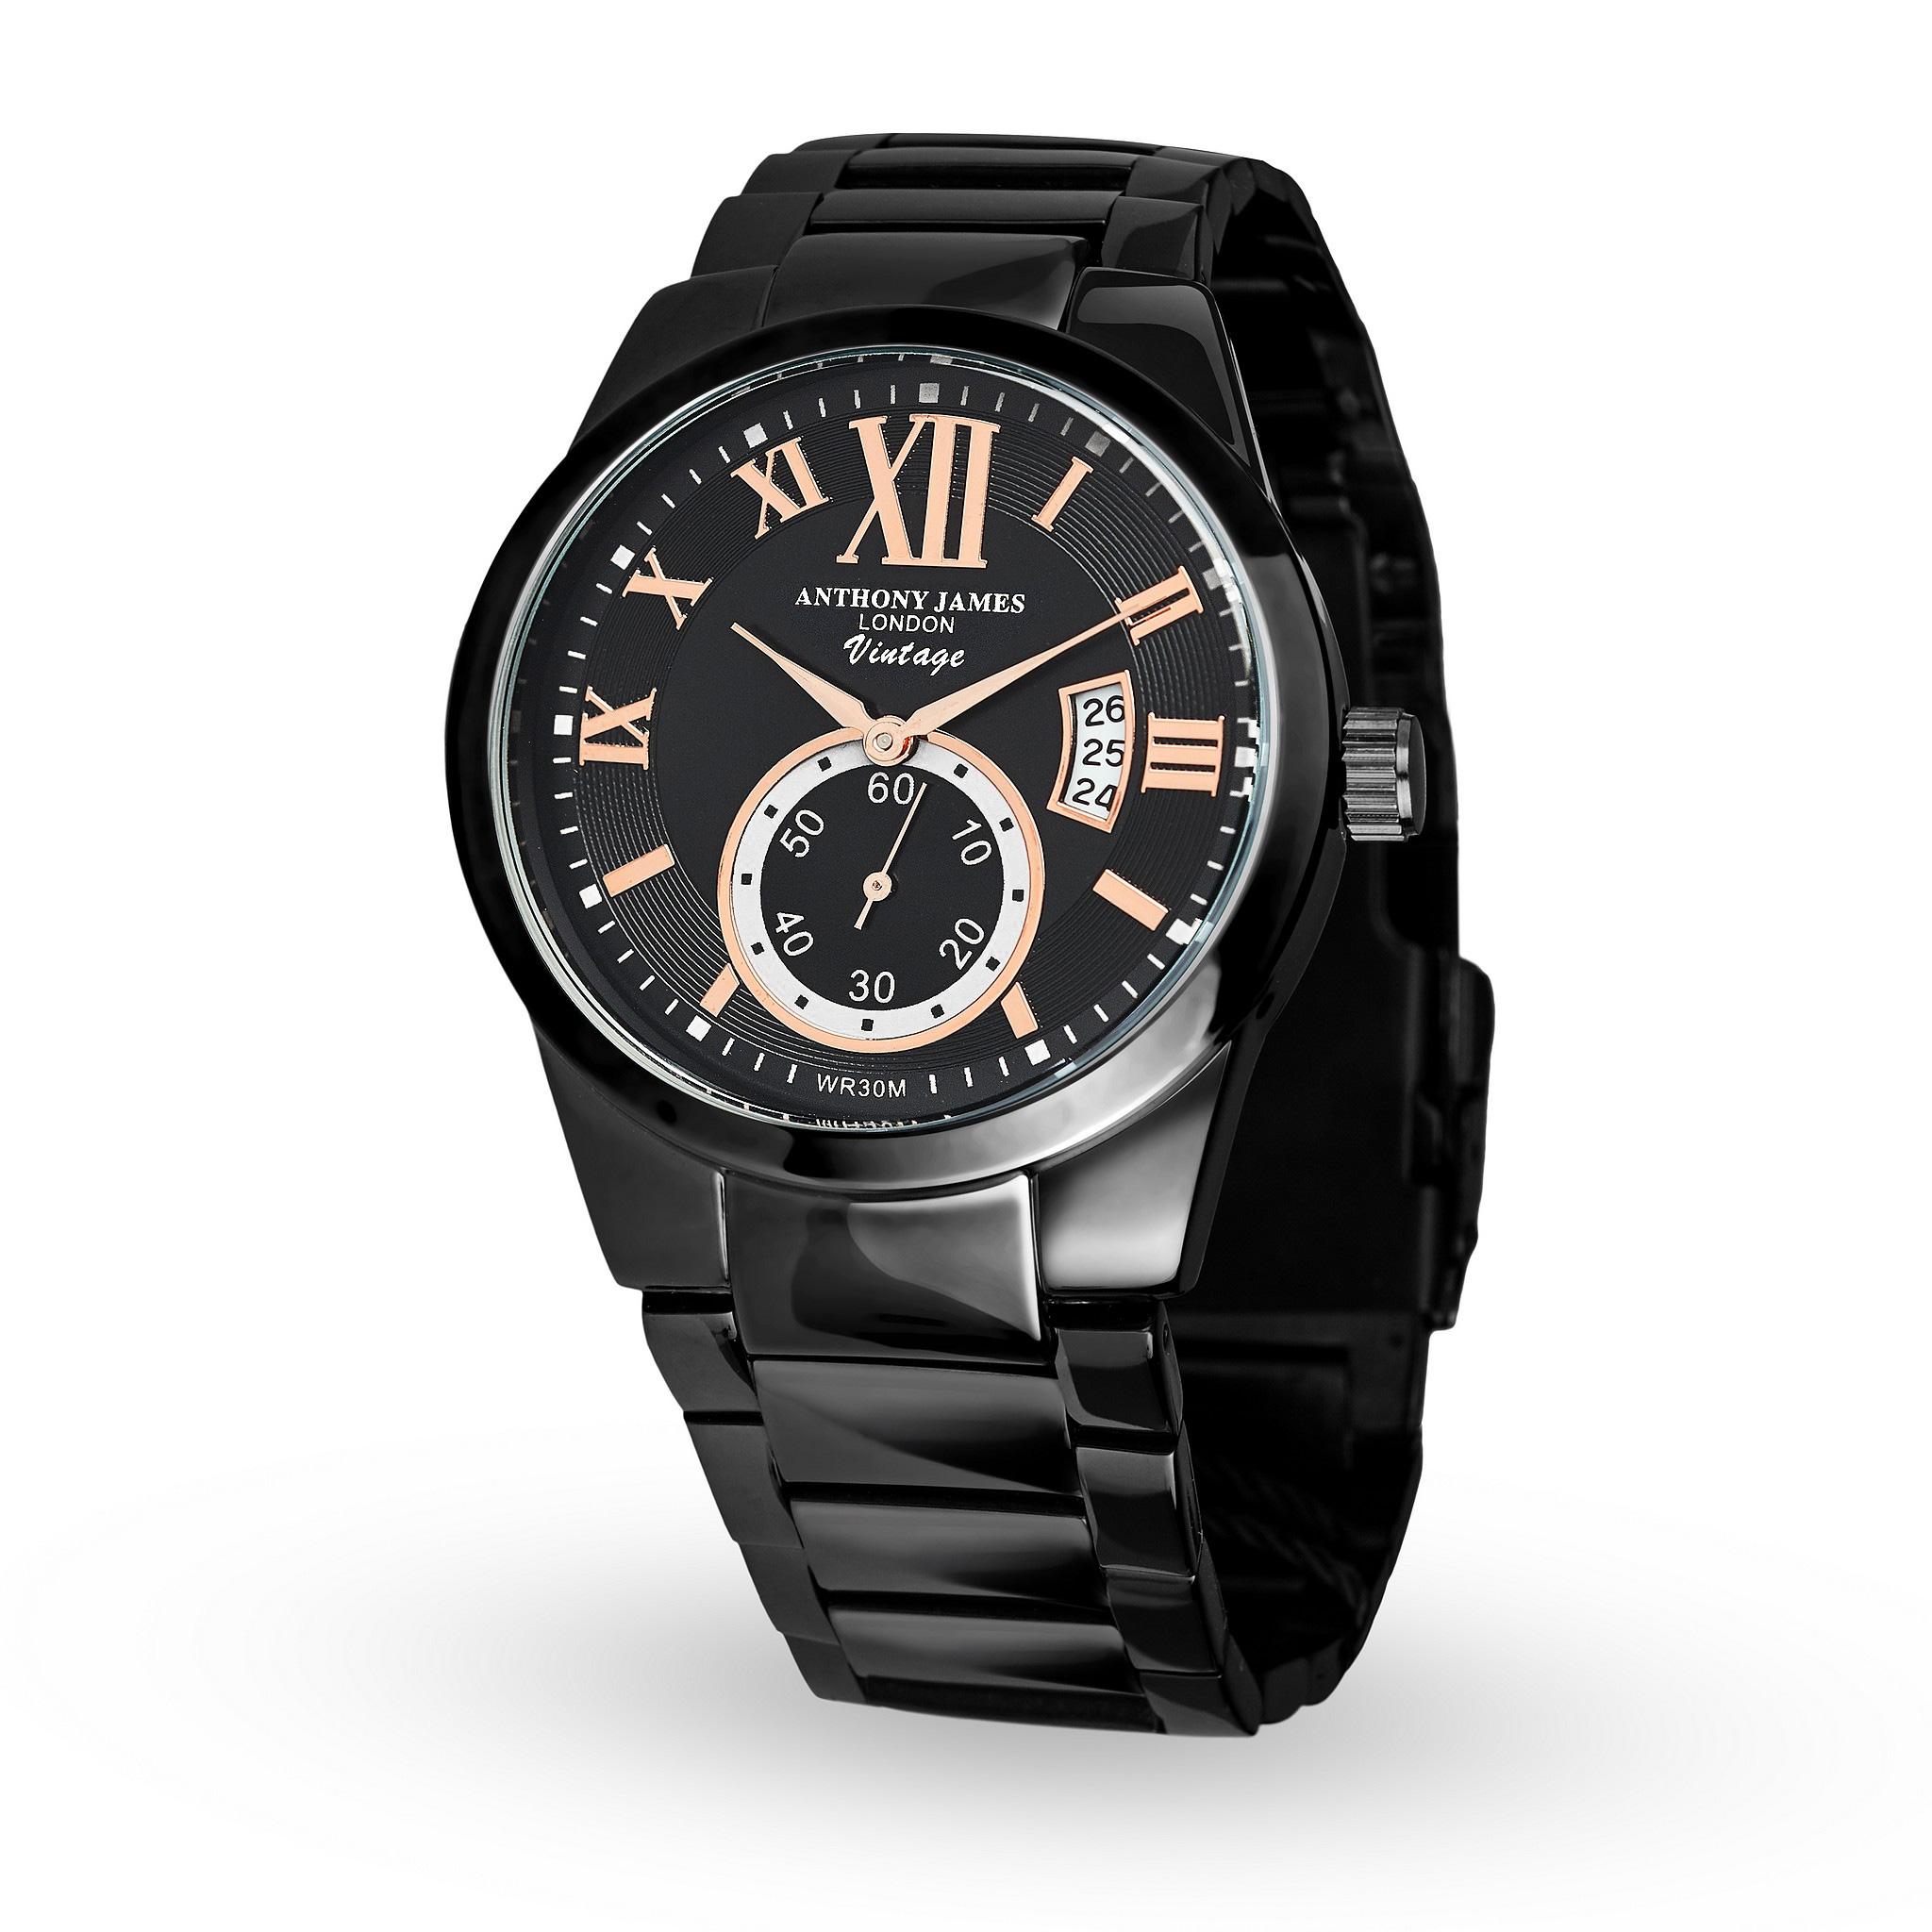 Ecco gli orologi Anthony James of London, vintage dal cuore inglese